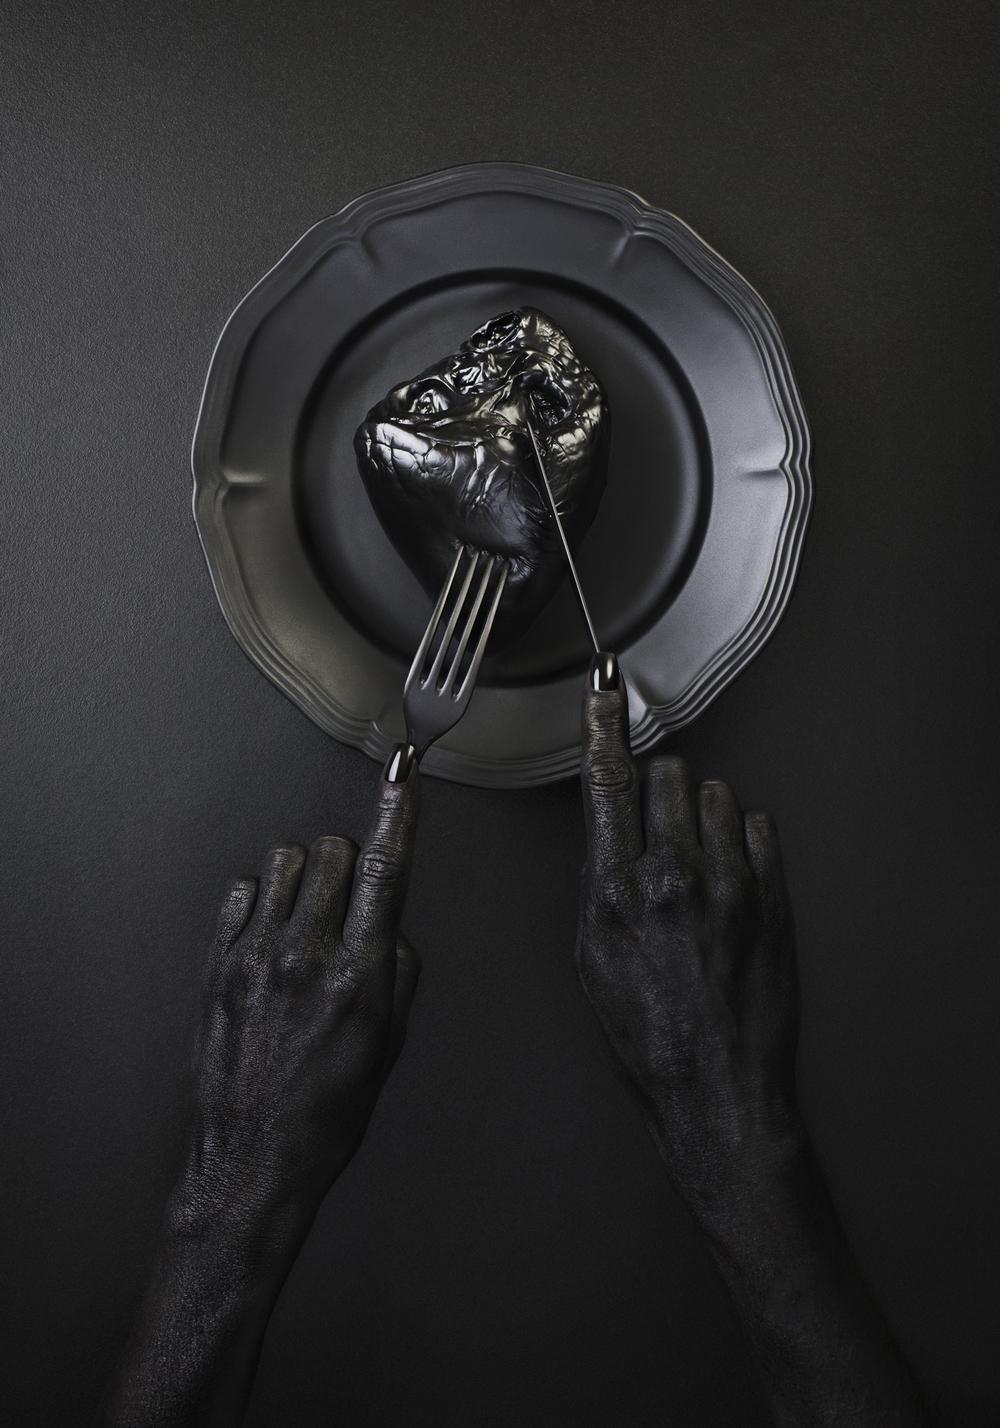 svart-244-Redigera.jpg